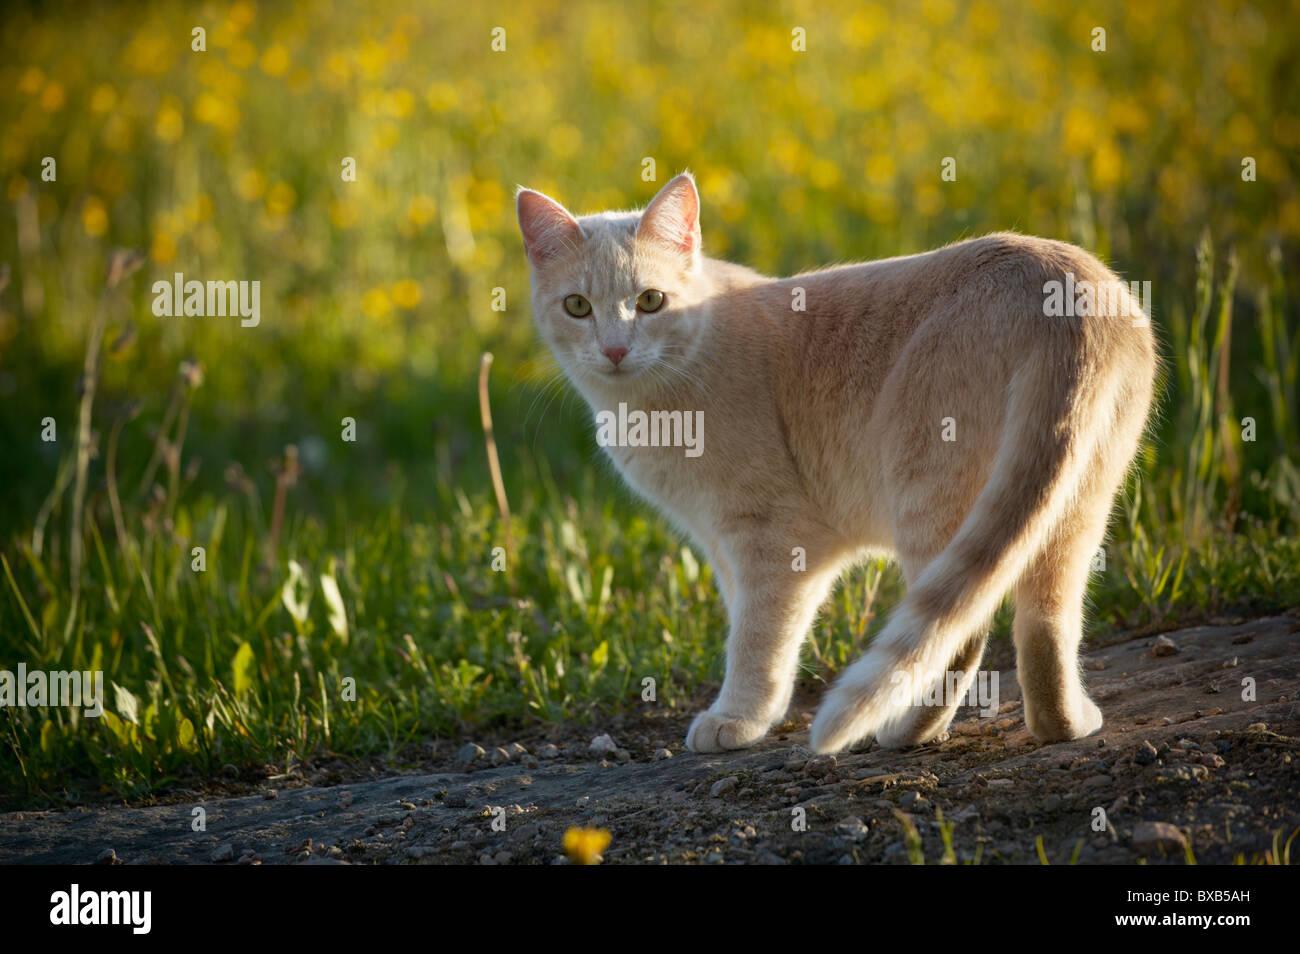 Ginger cat - Stock Image